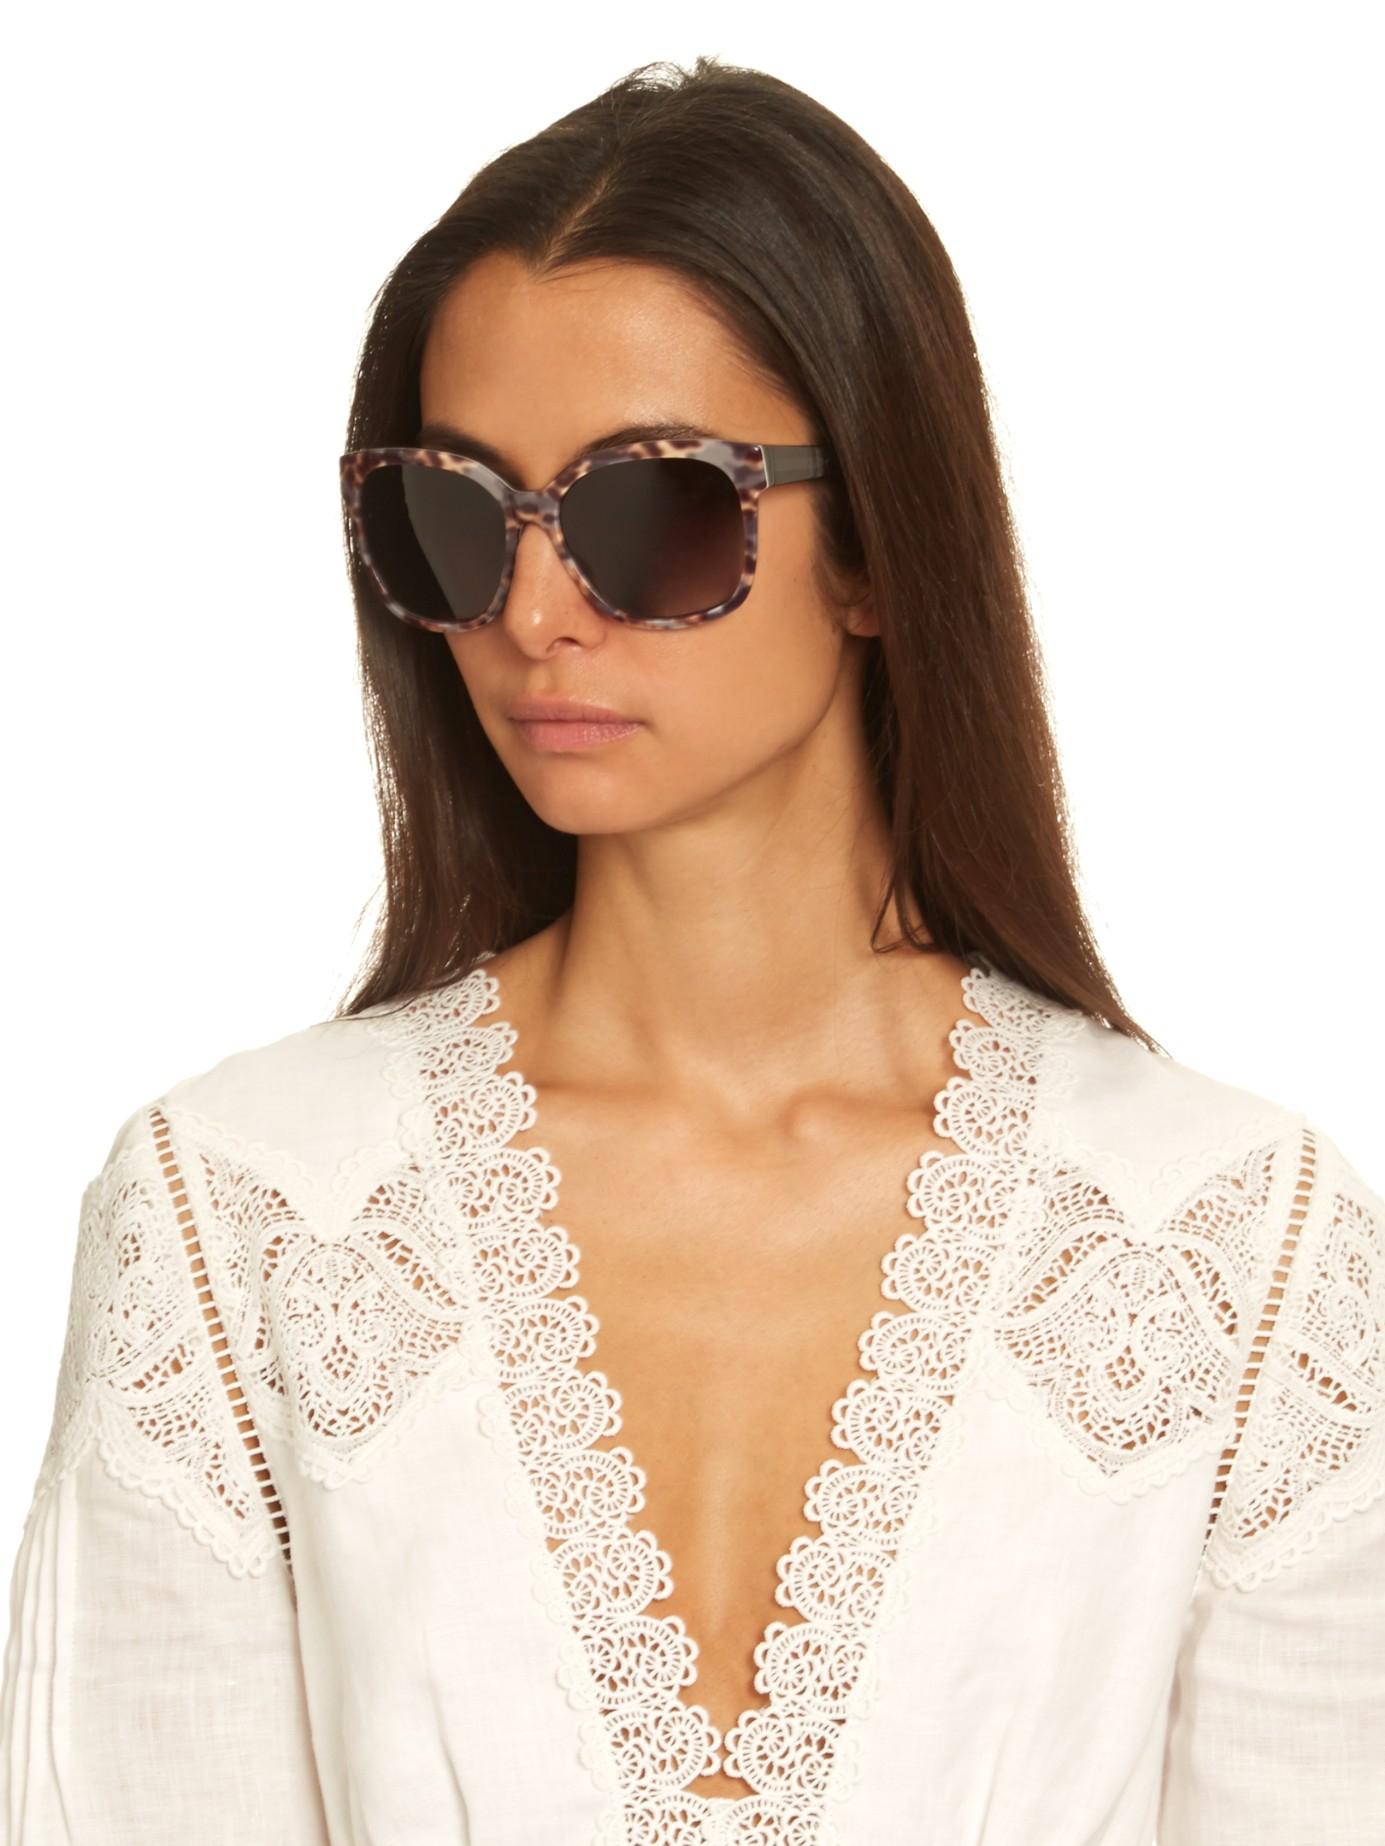 lyst diane von furstenberg julianna sunglasses in black. Black Bedroom Furniture Sets. Home Design Ideas